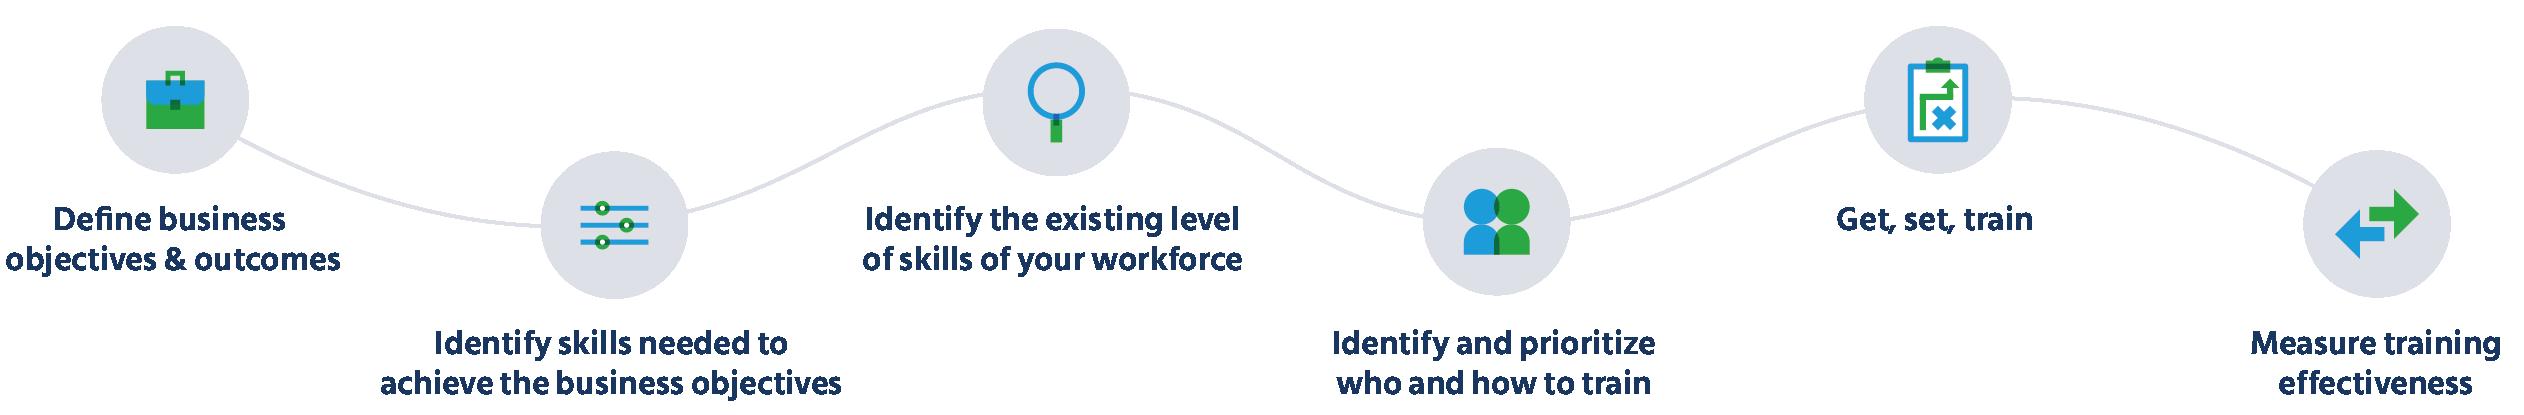 step-by-step process to conduct atraining needs analysis